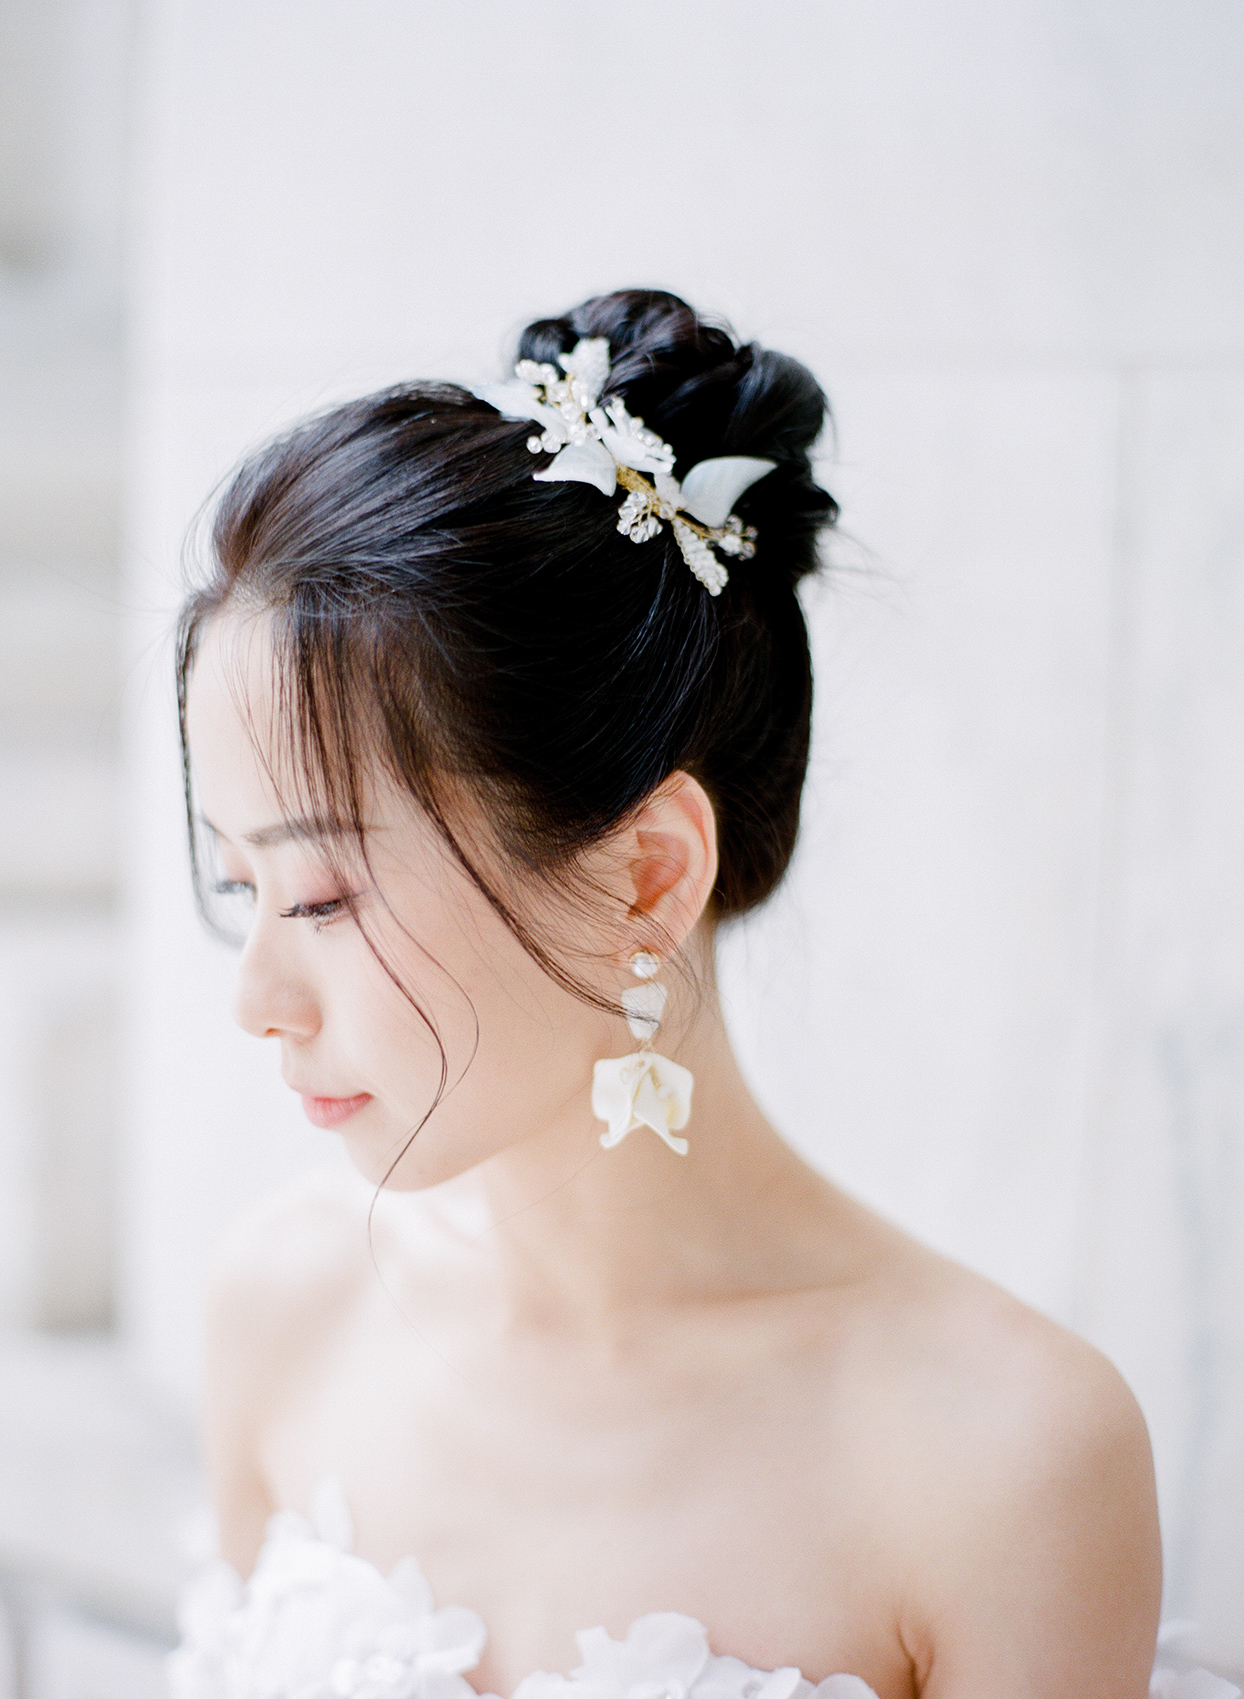 bride close up portrait with white floral accessories